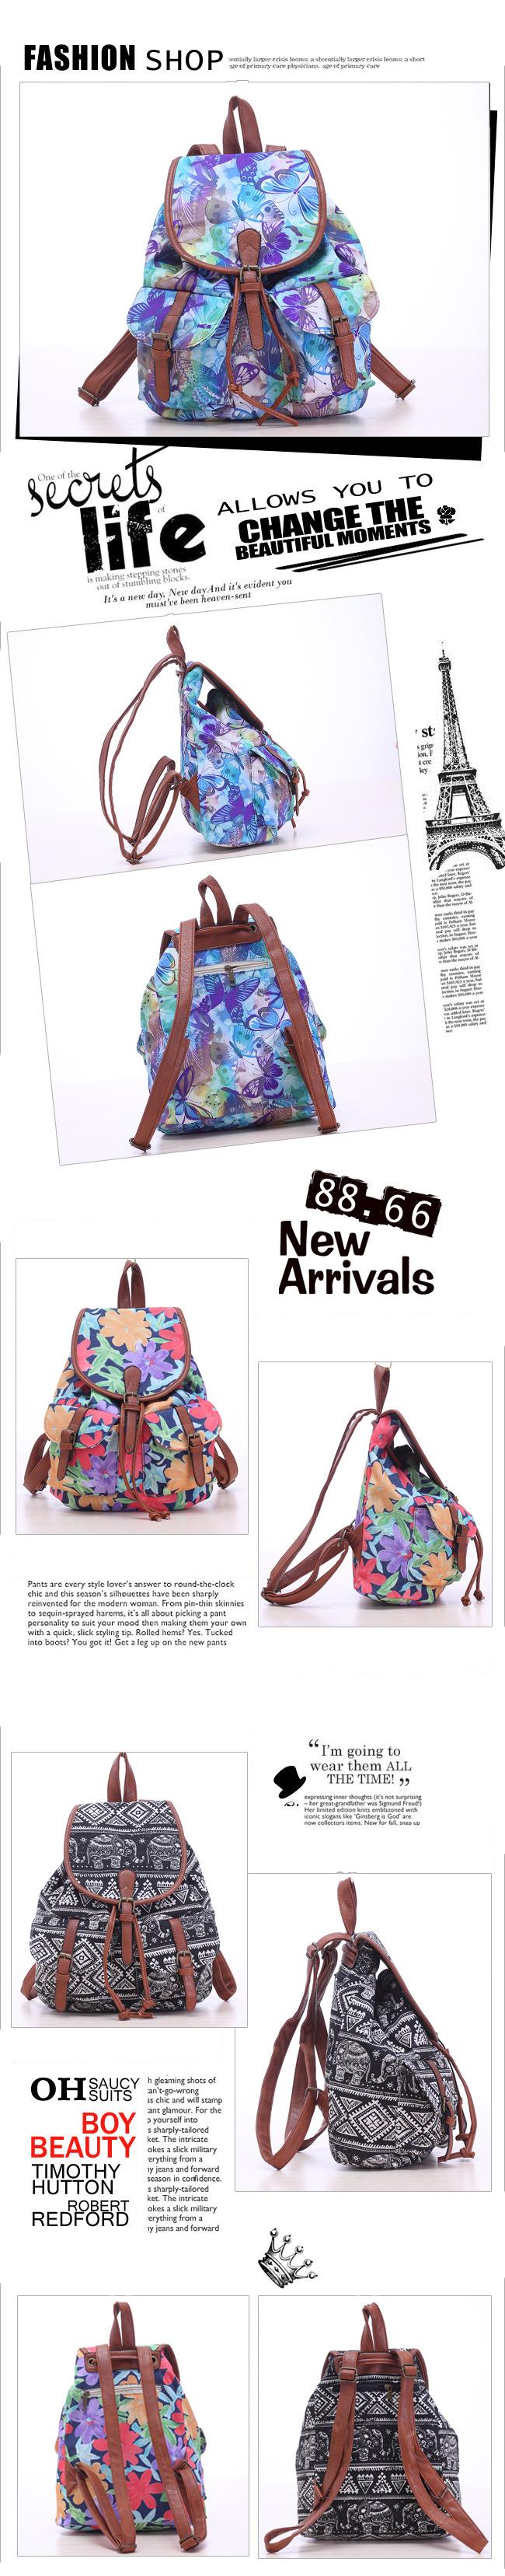 5aa1a74c8fd Vintage Women s Canvas Travel Rucksack Hobo printing School Bag ...